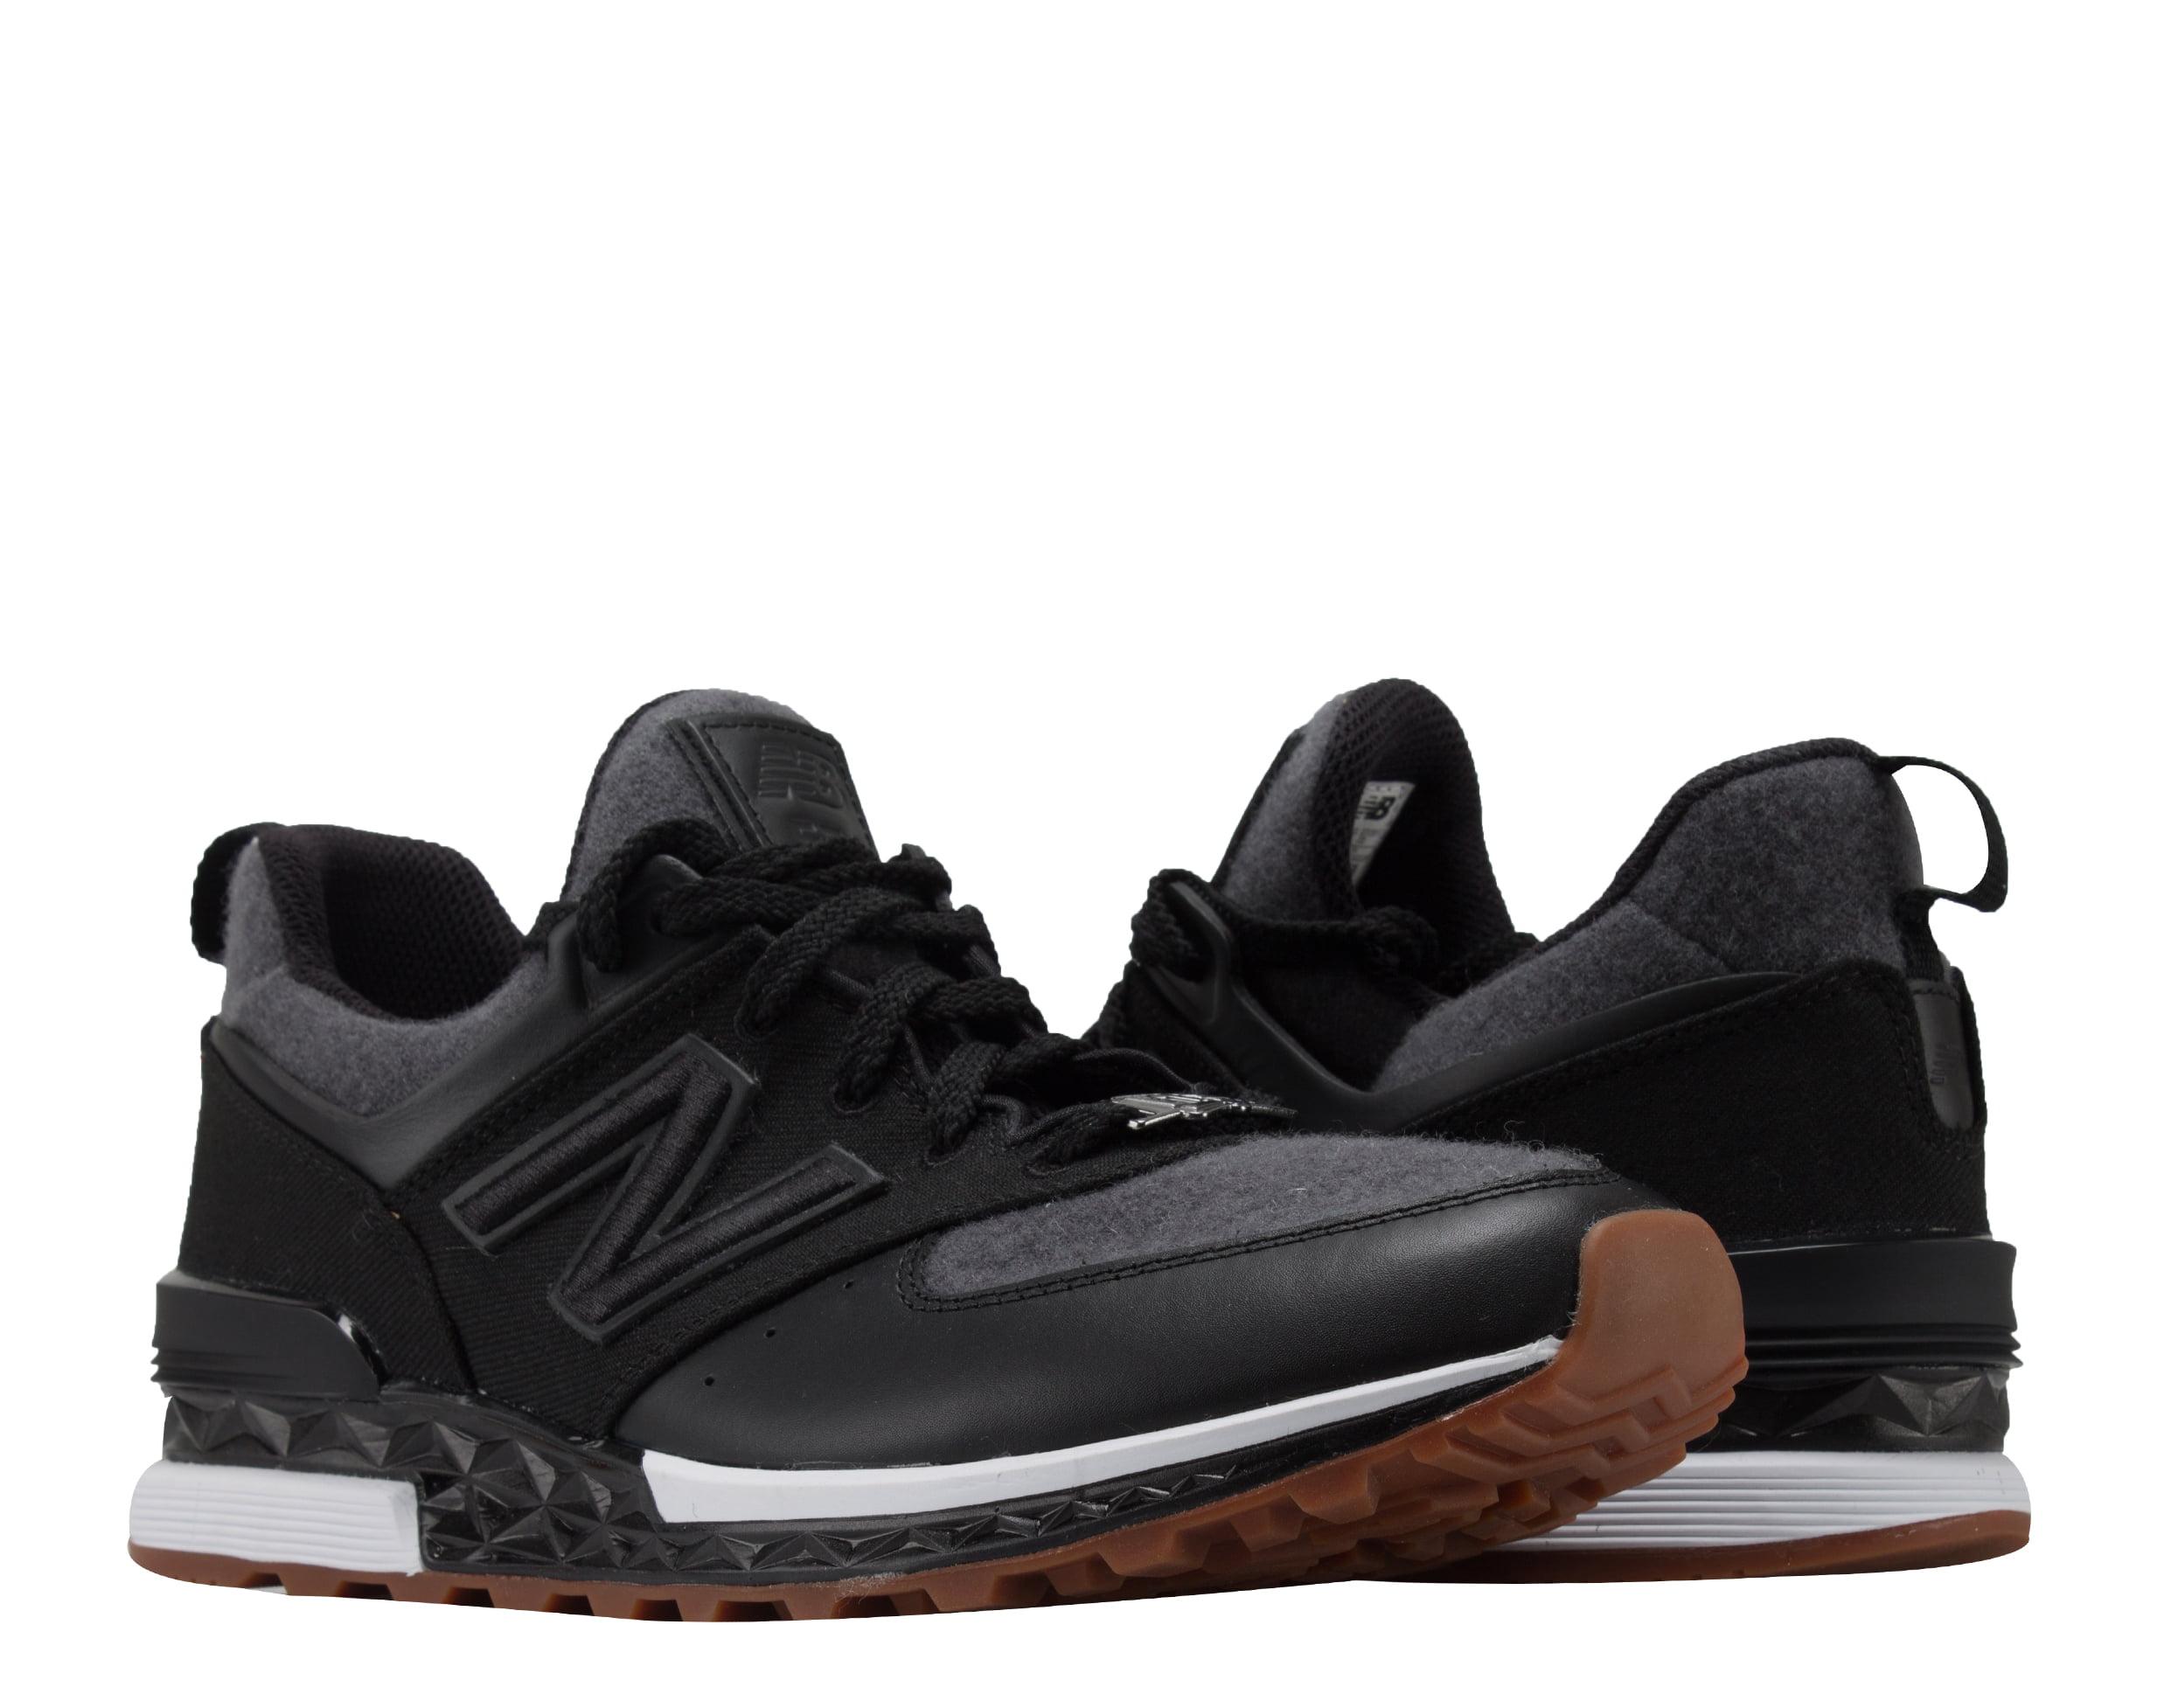 New Balance - New Balance x New Era 574 Sport Black Dark Grey Men s Running  Shoes MS574NE - Walmart.com 1a9d5df6b19